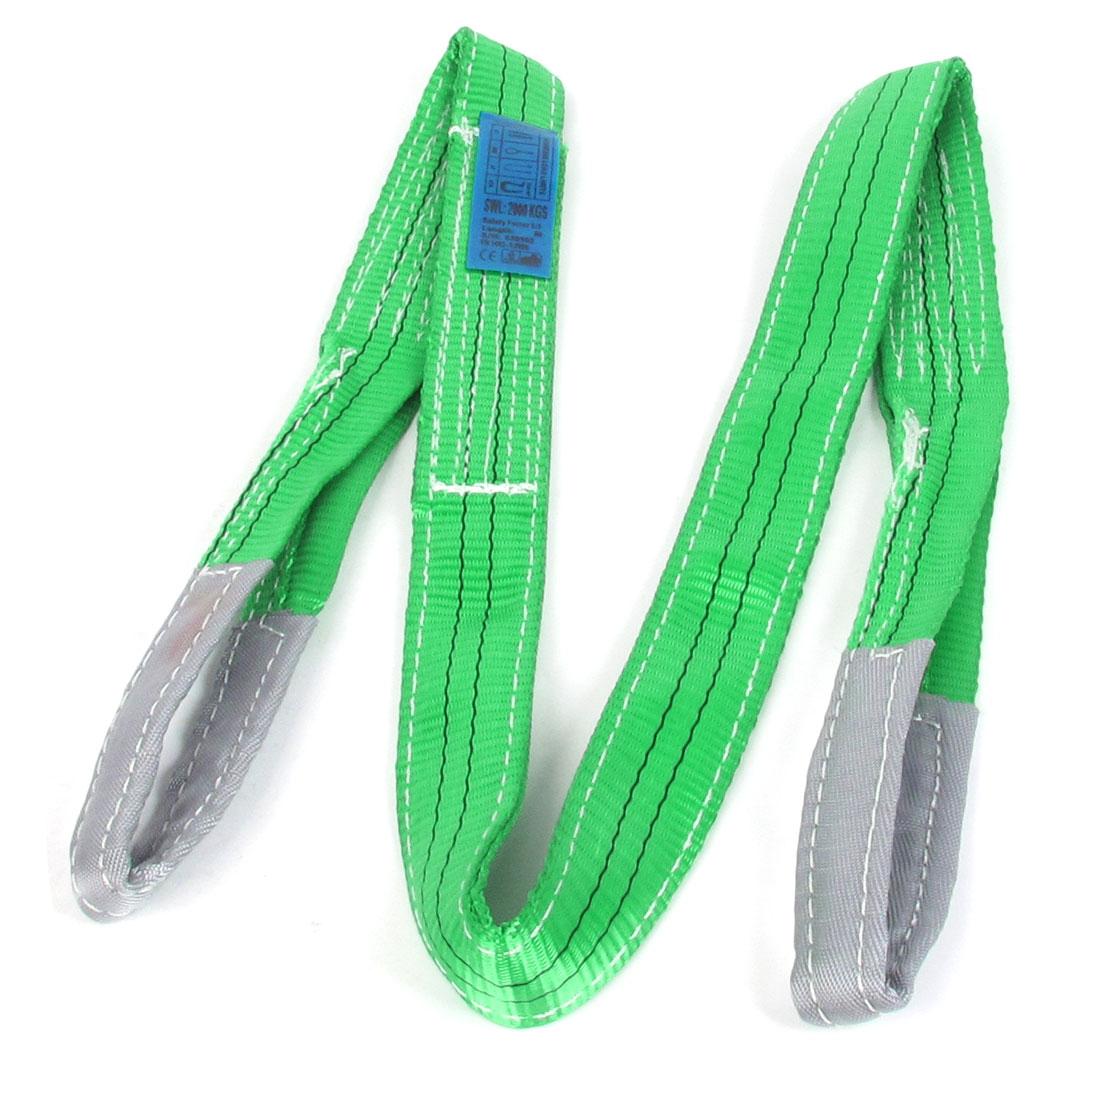 2 Ton SWL Green Gray Tow Strap Hoist Webbing Lifting Strap 2M Long